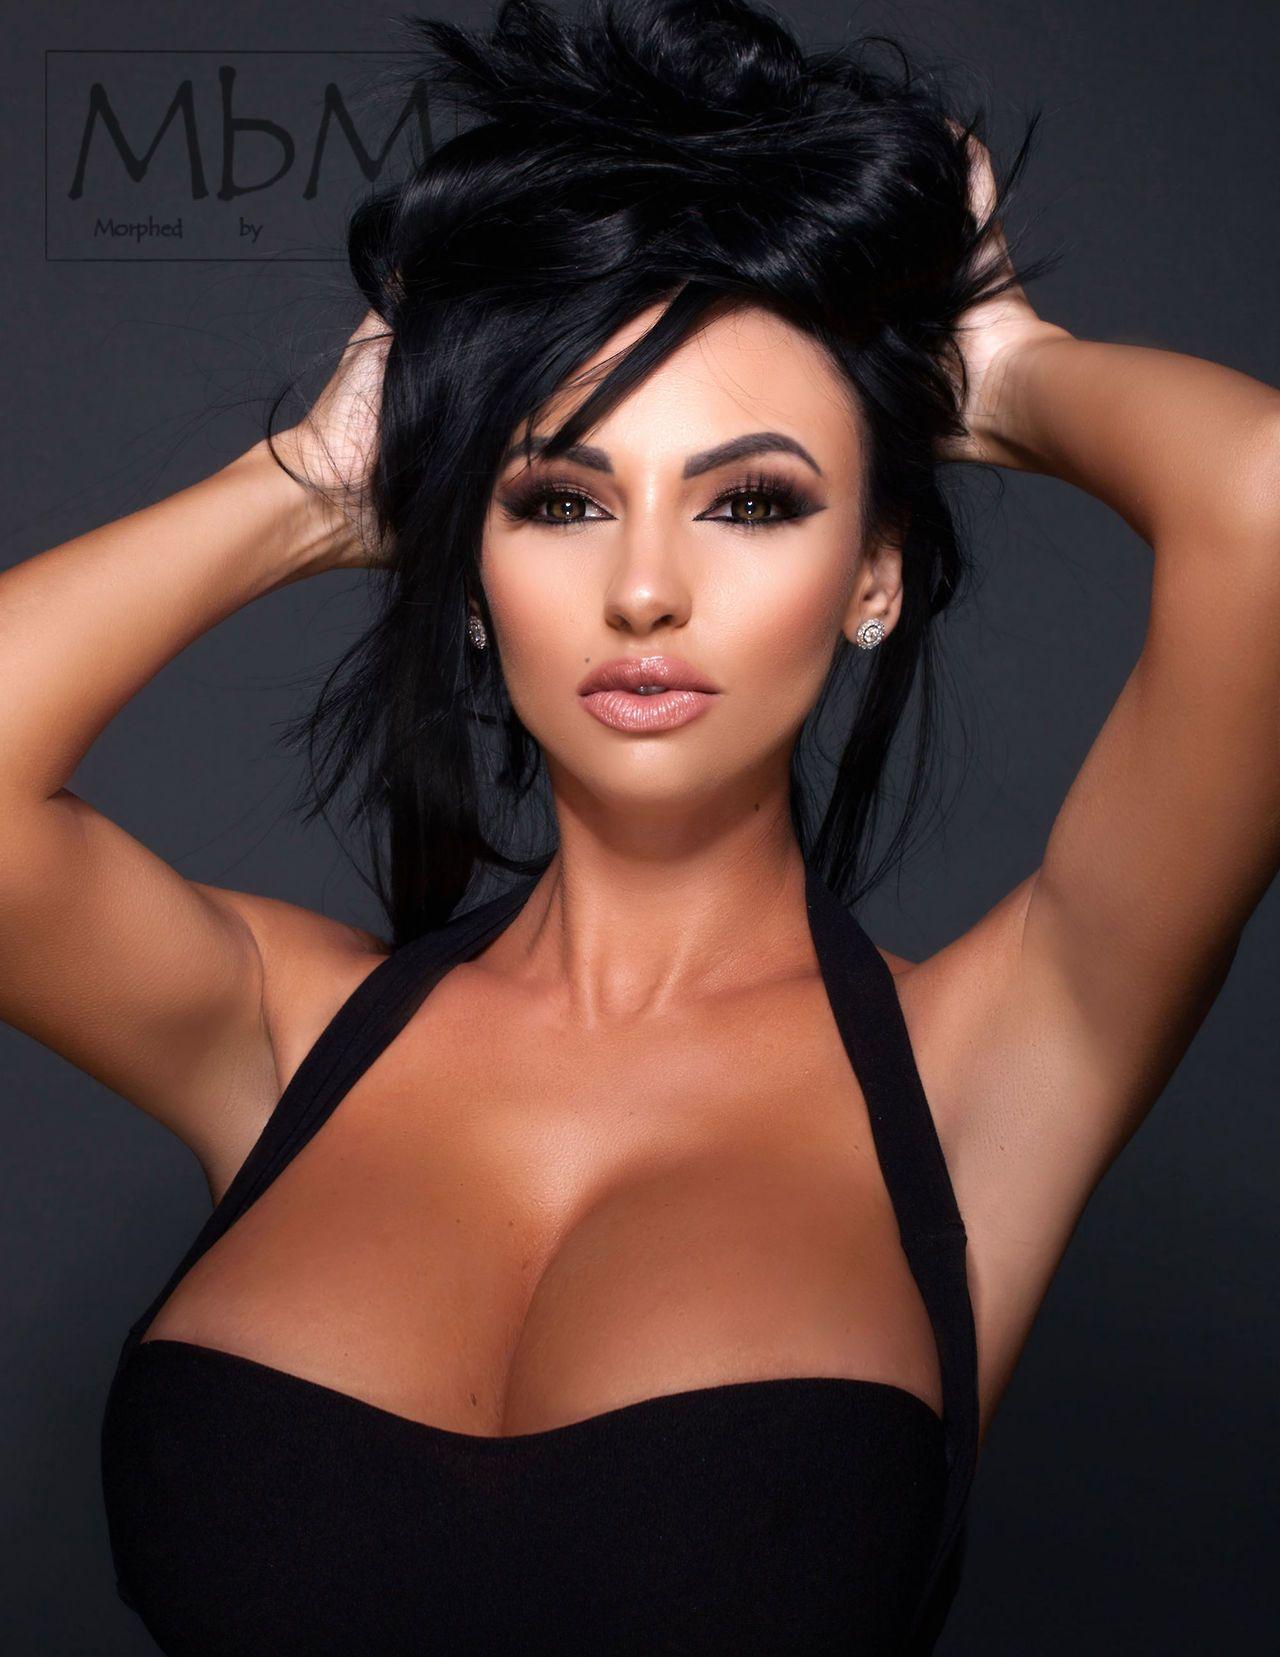 Paparazzi Iryna Ivanova naked (16 foto and video), Ass, Leaked, Selfie, swimsuit 2019